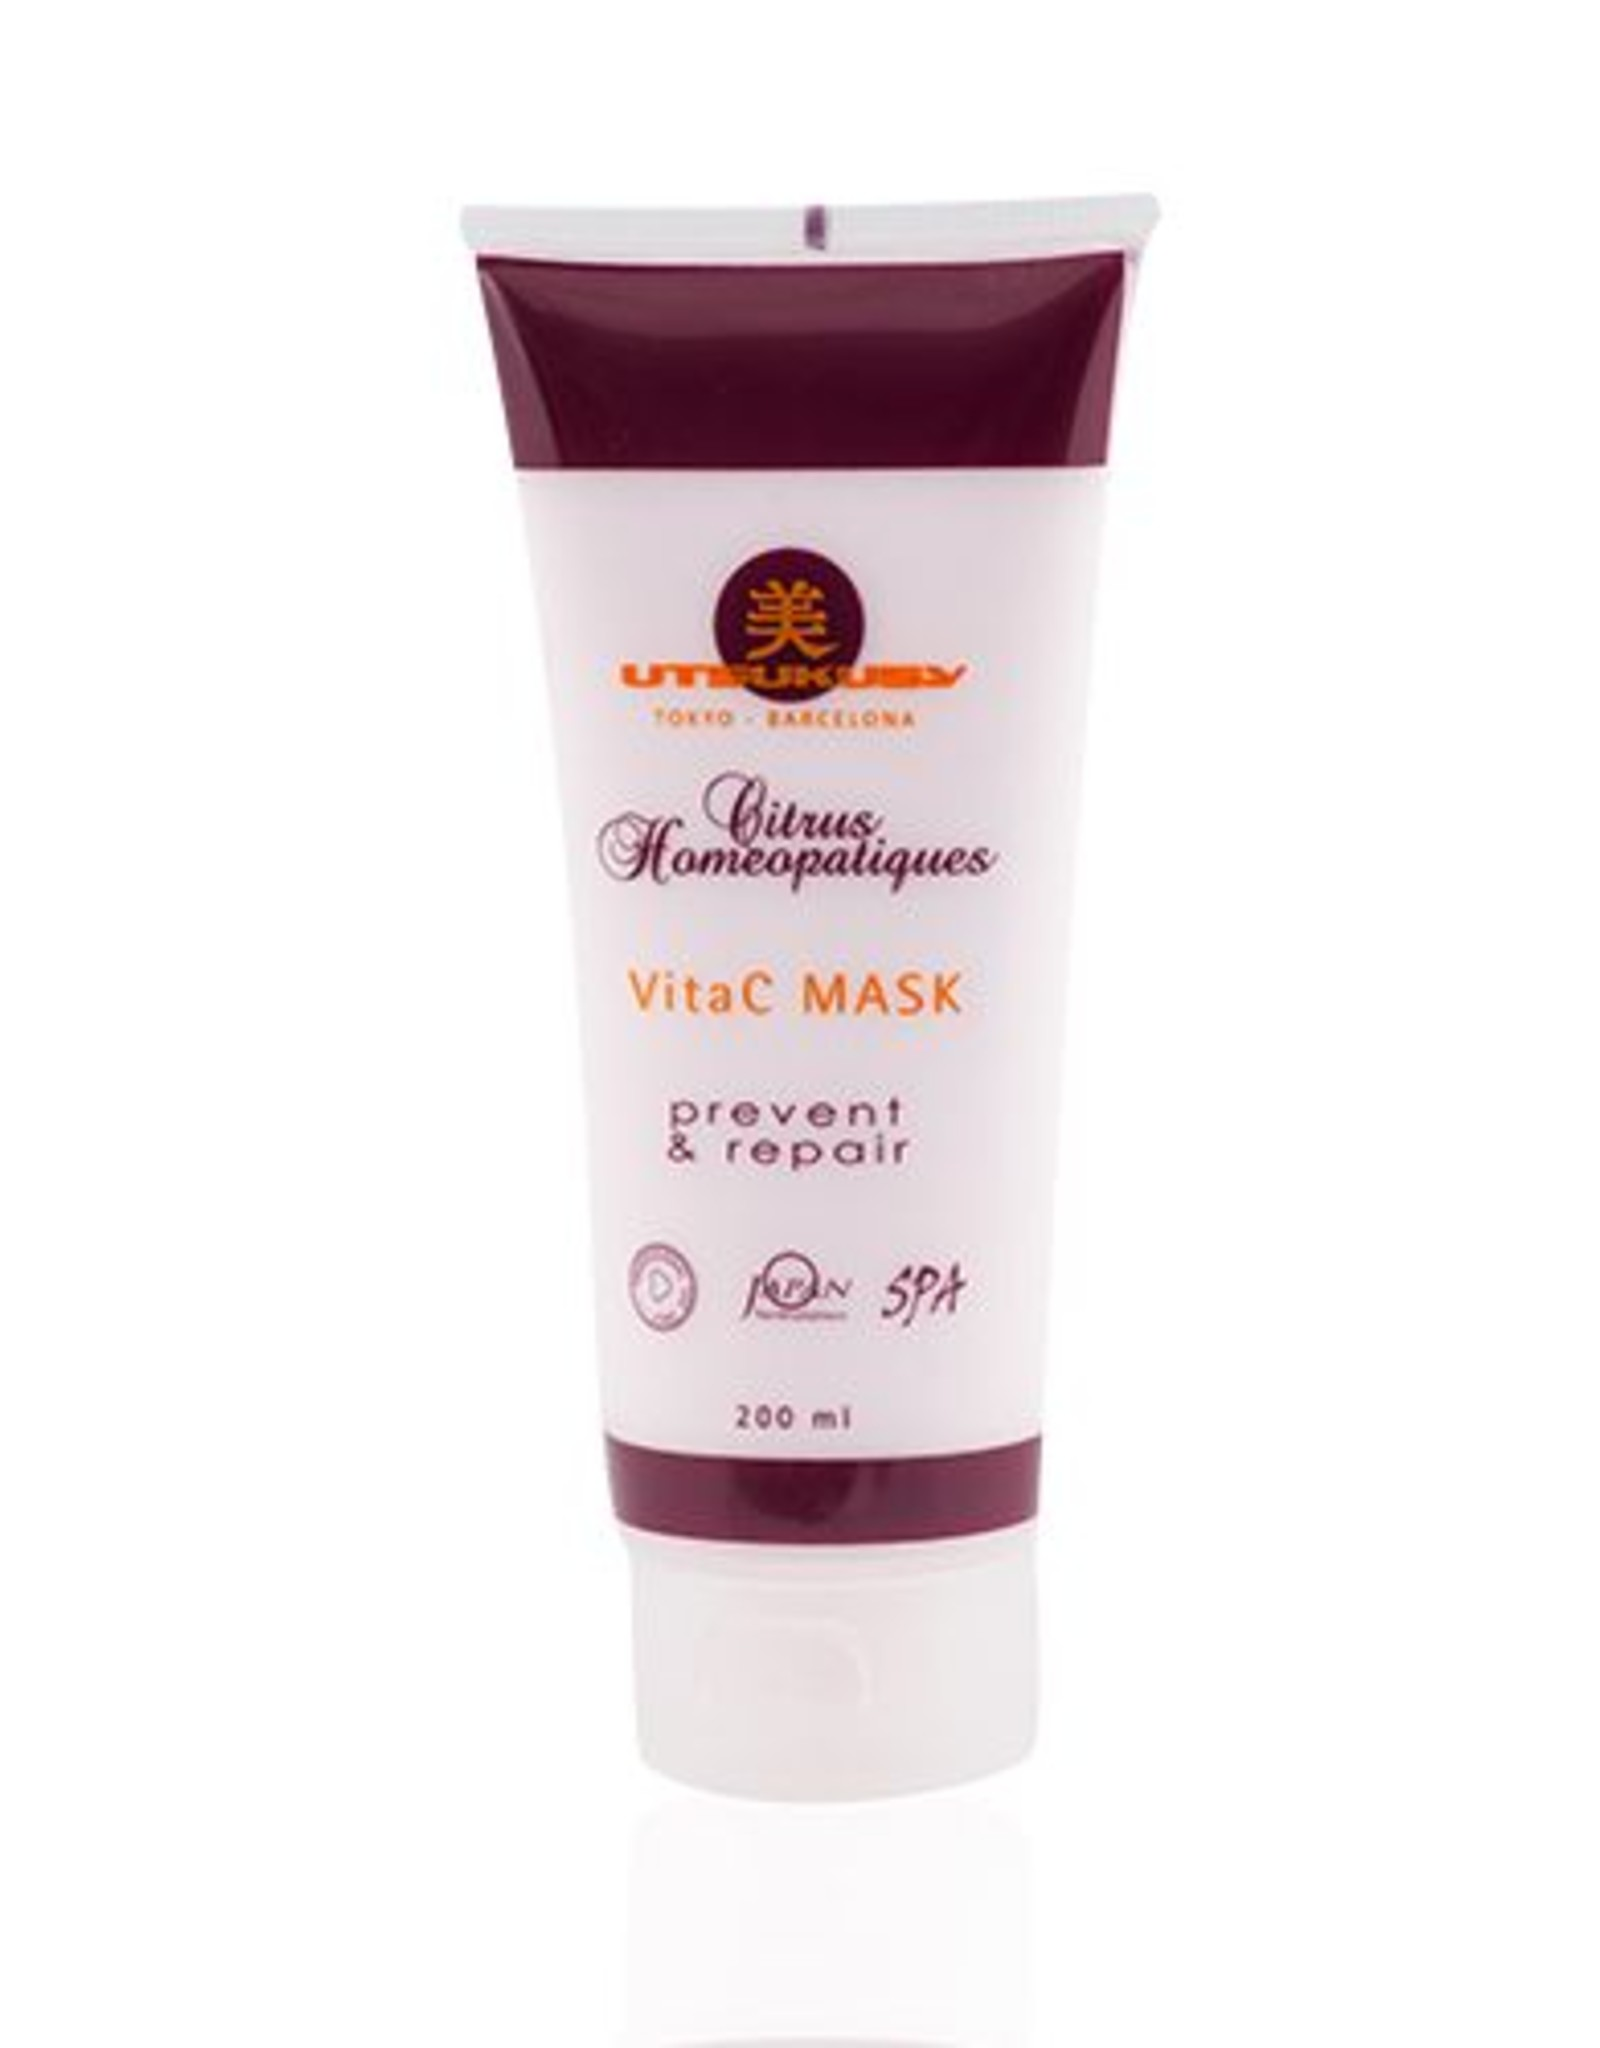 Utsukusy Citus Homeopatique Vitamin C facial mask 200ml